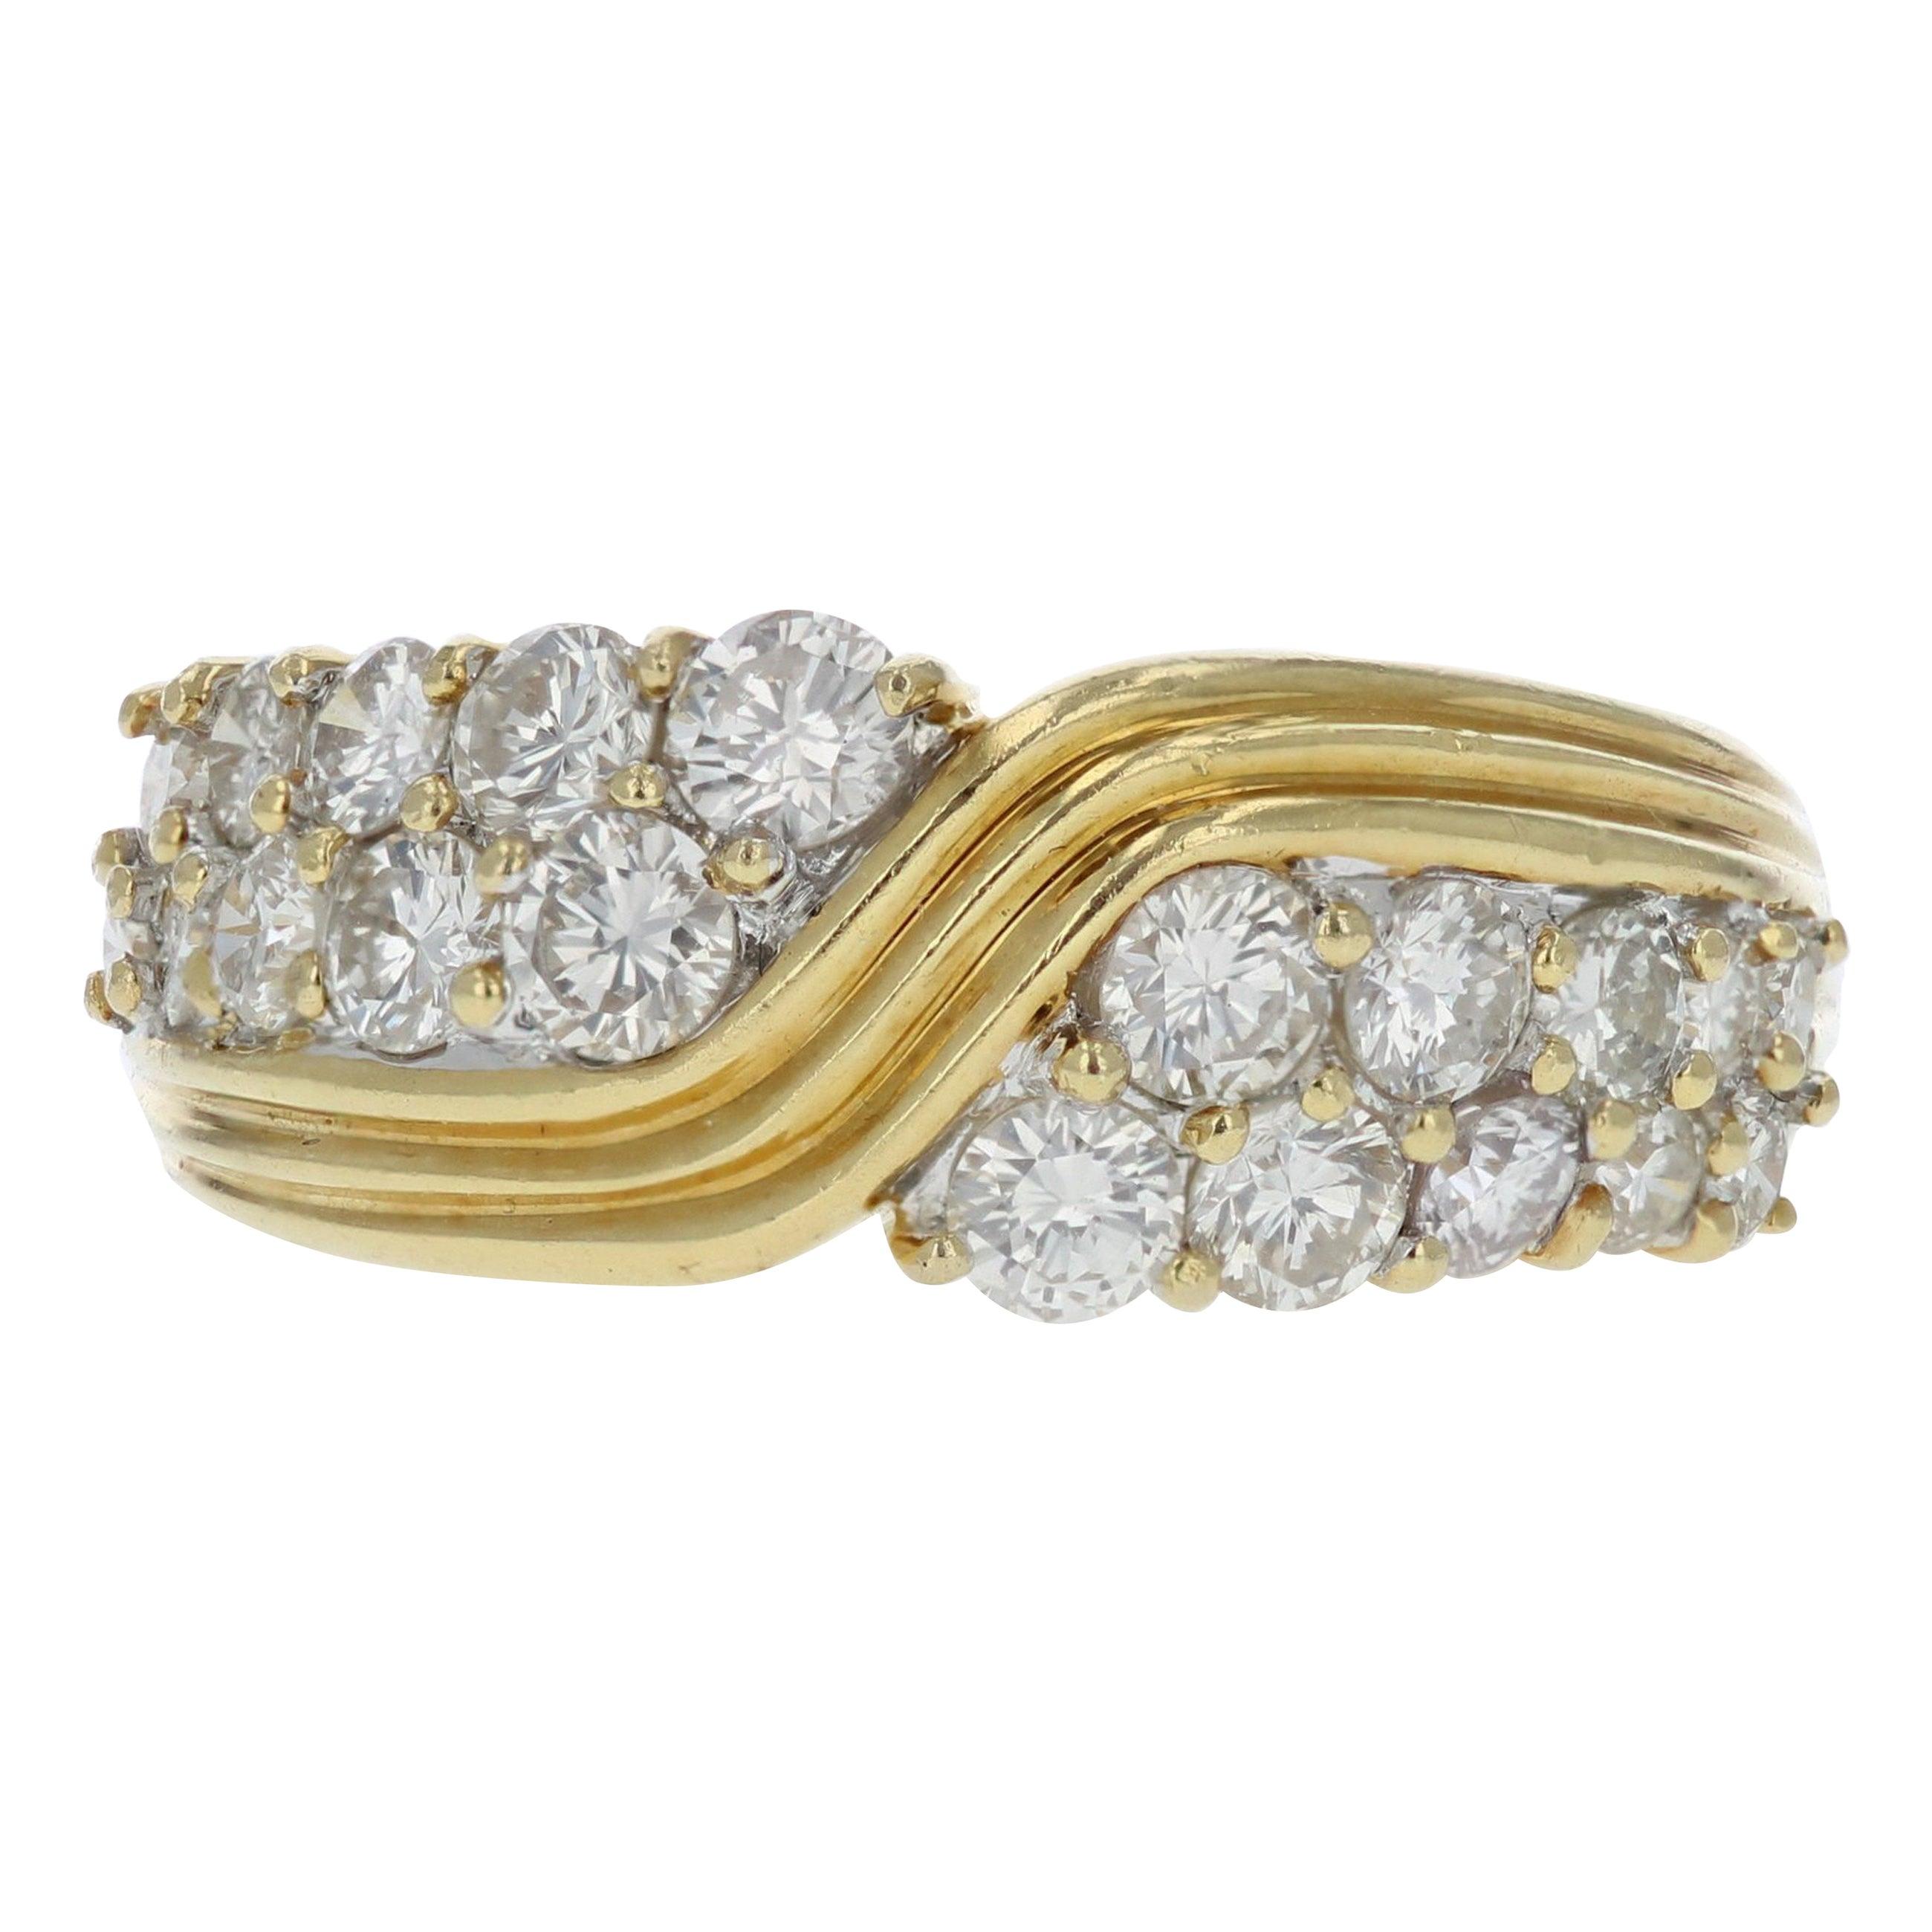 Geometric Yellow Gold and Diamond Retro Ring